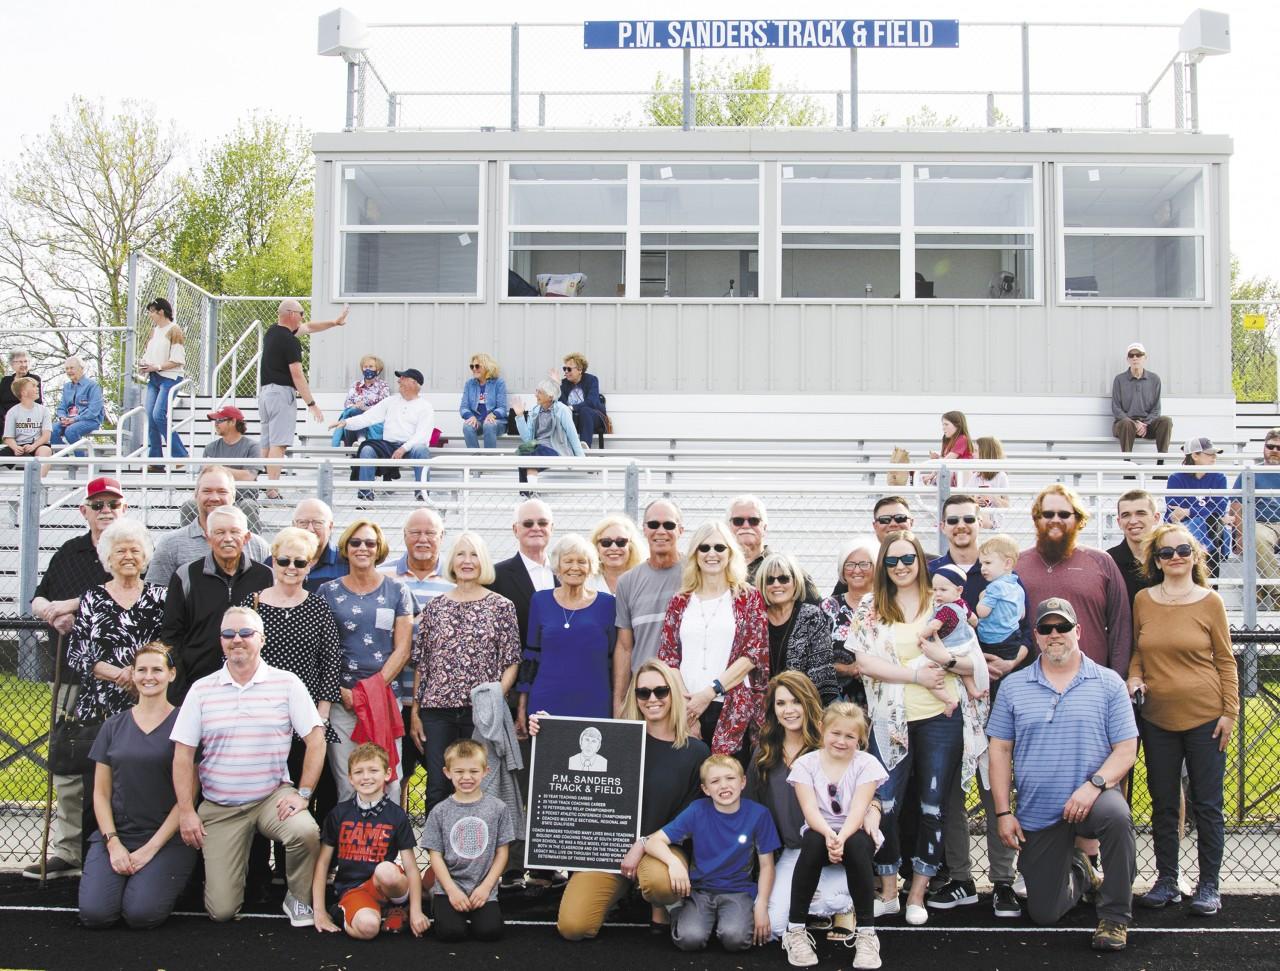 P.M. Sanders Track & Field Dedication